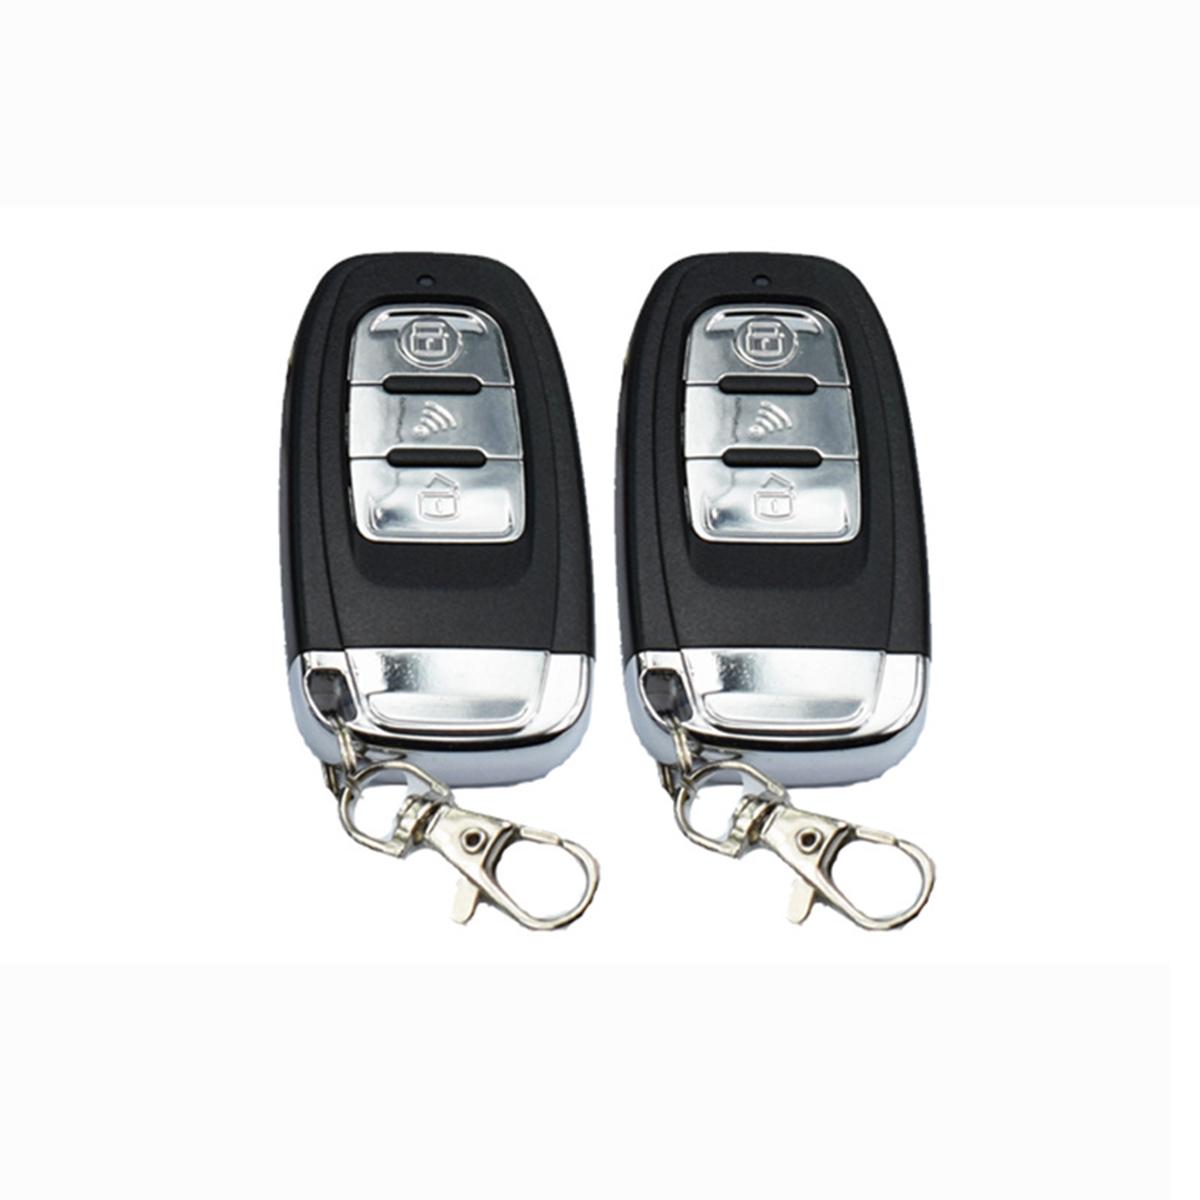 Car Alarm System PKE Keyless Entry Push Button Engine Ignition Start Remote